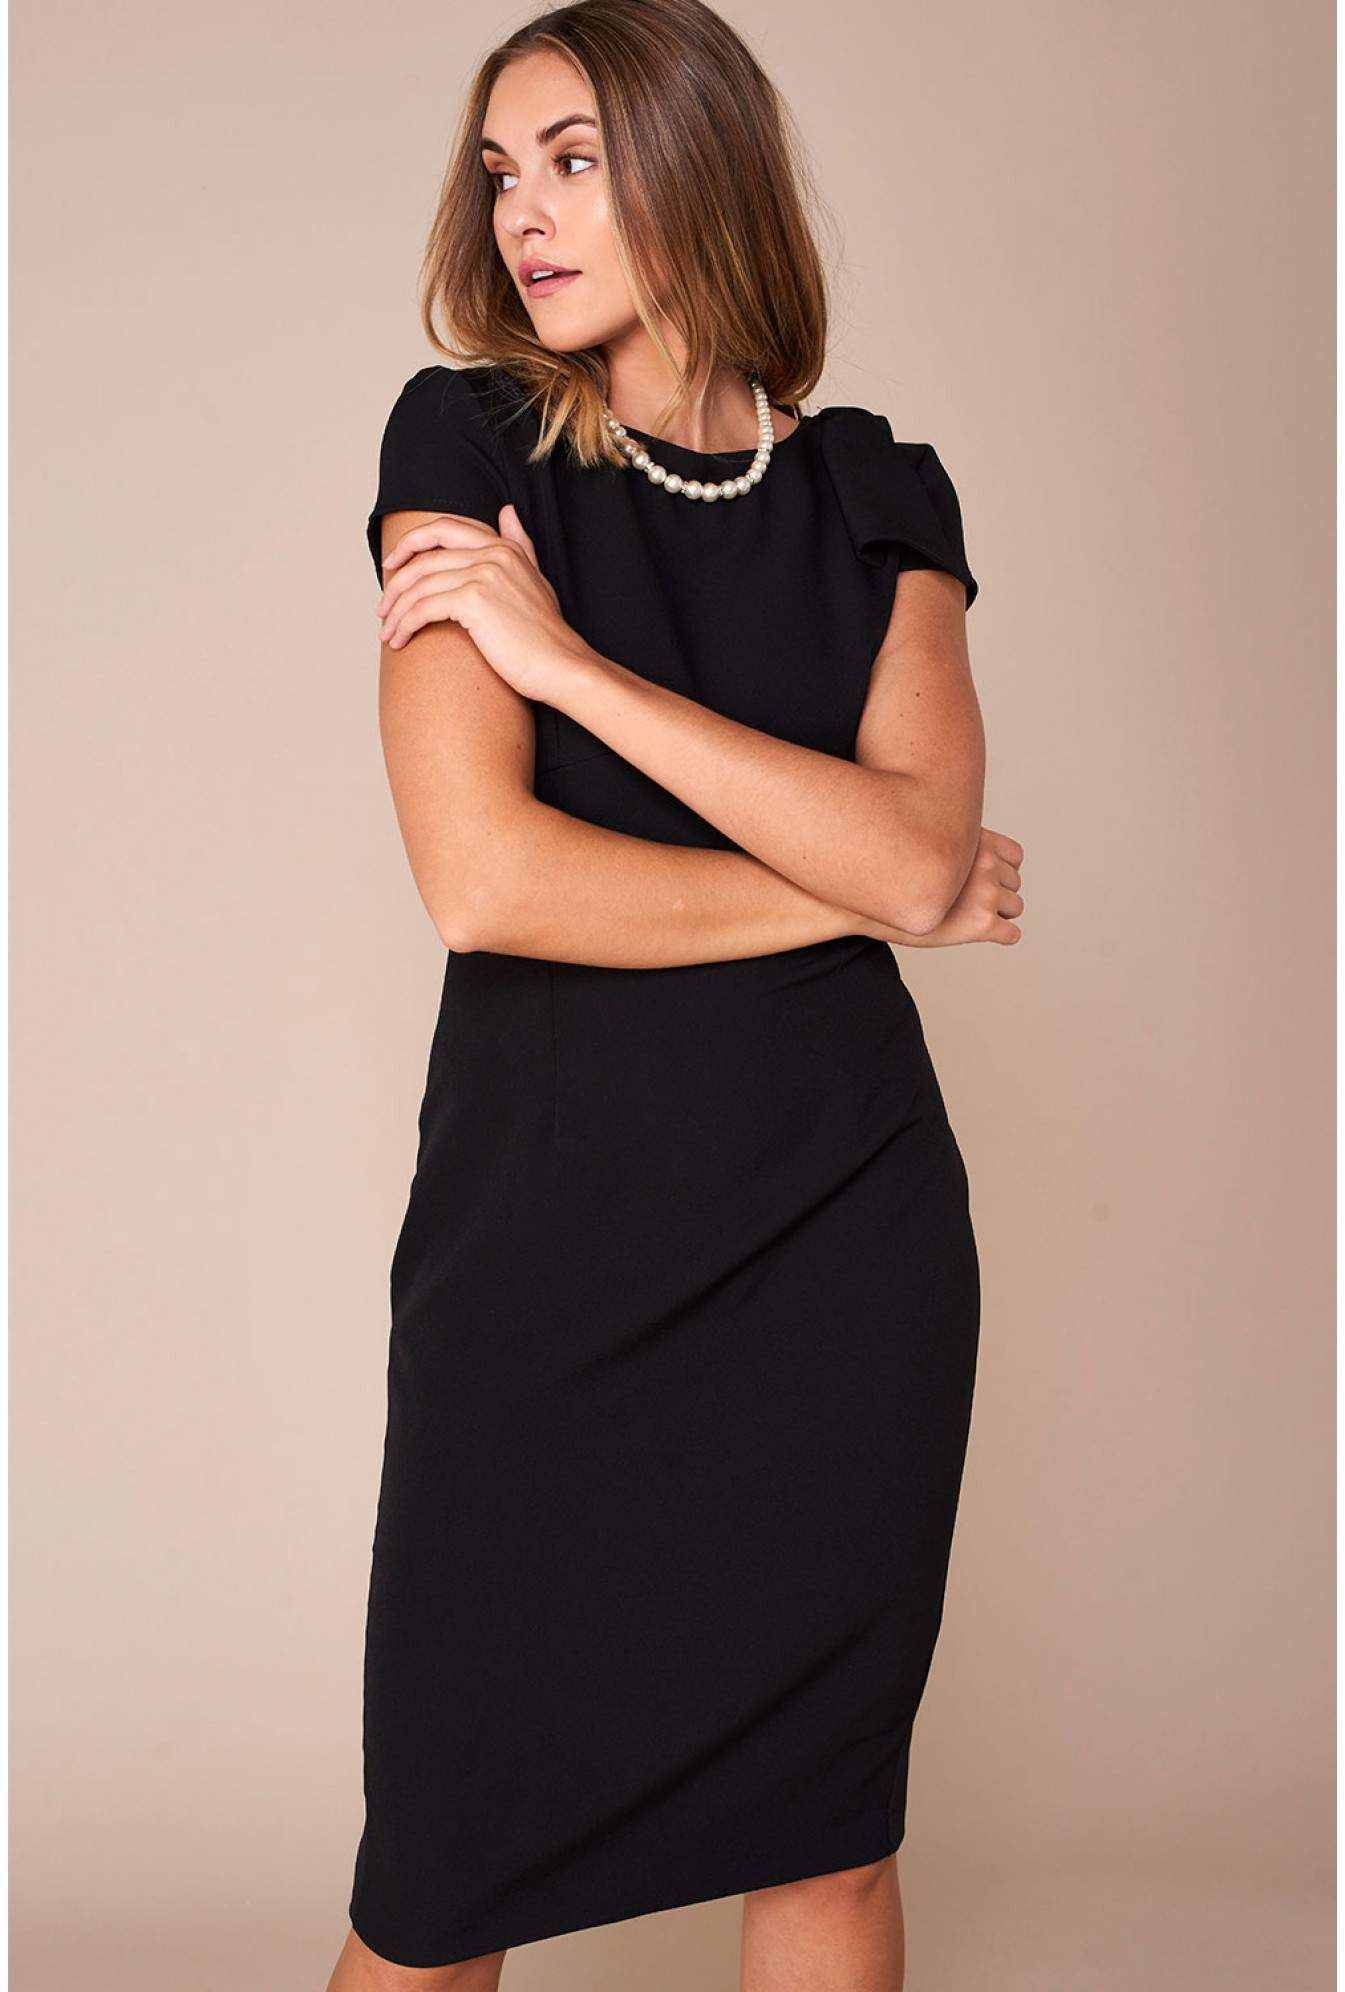 fbe34bd3d176 Ad Lib Levi Occasion Midi Dress in Black   iCLOTHING